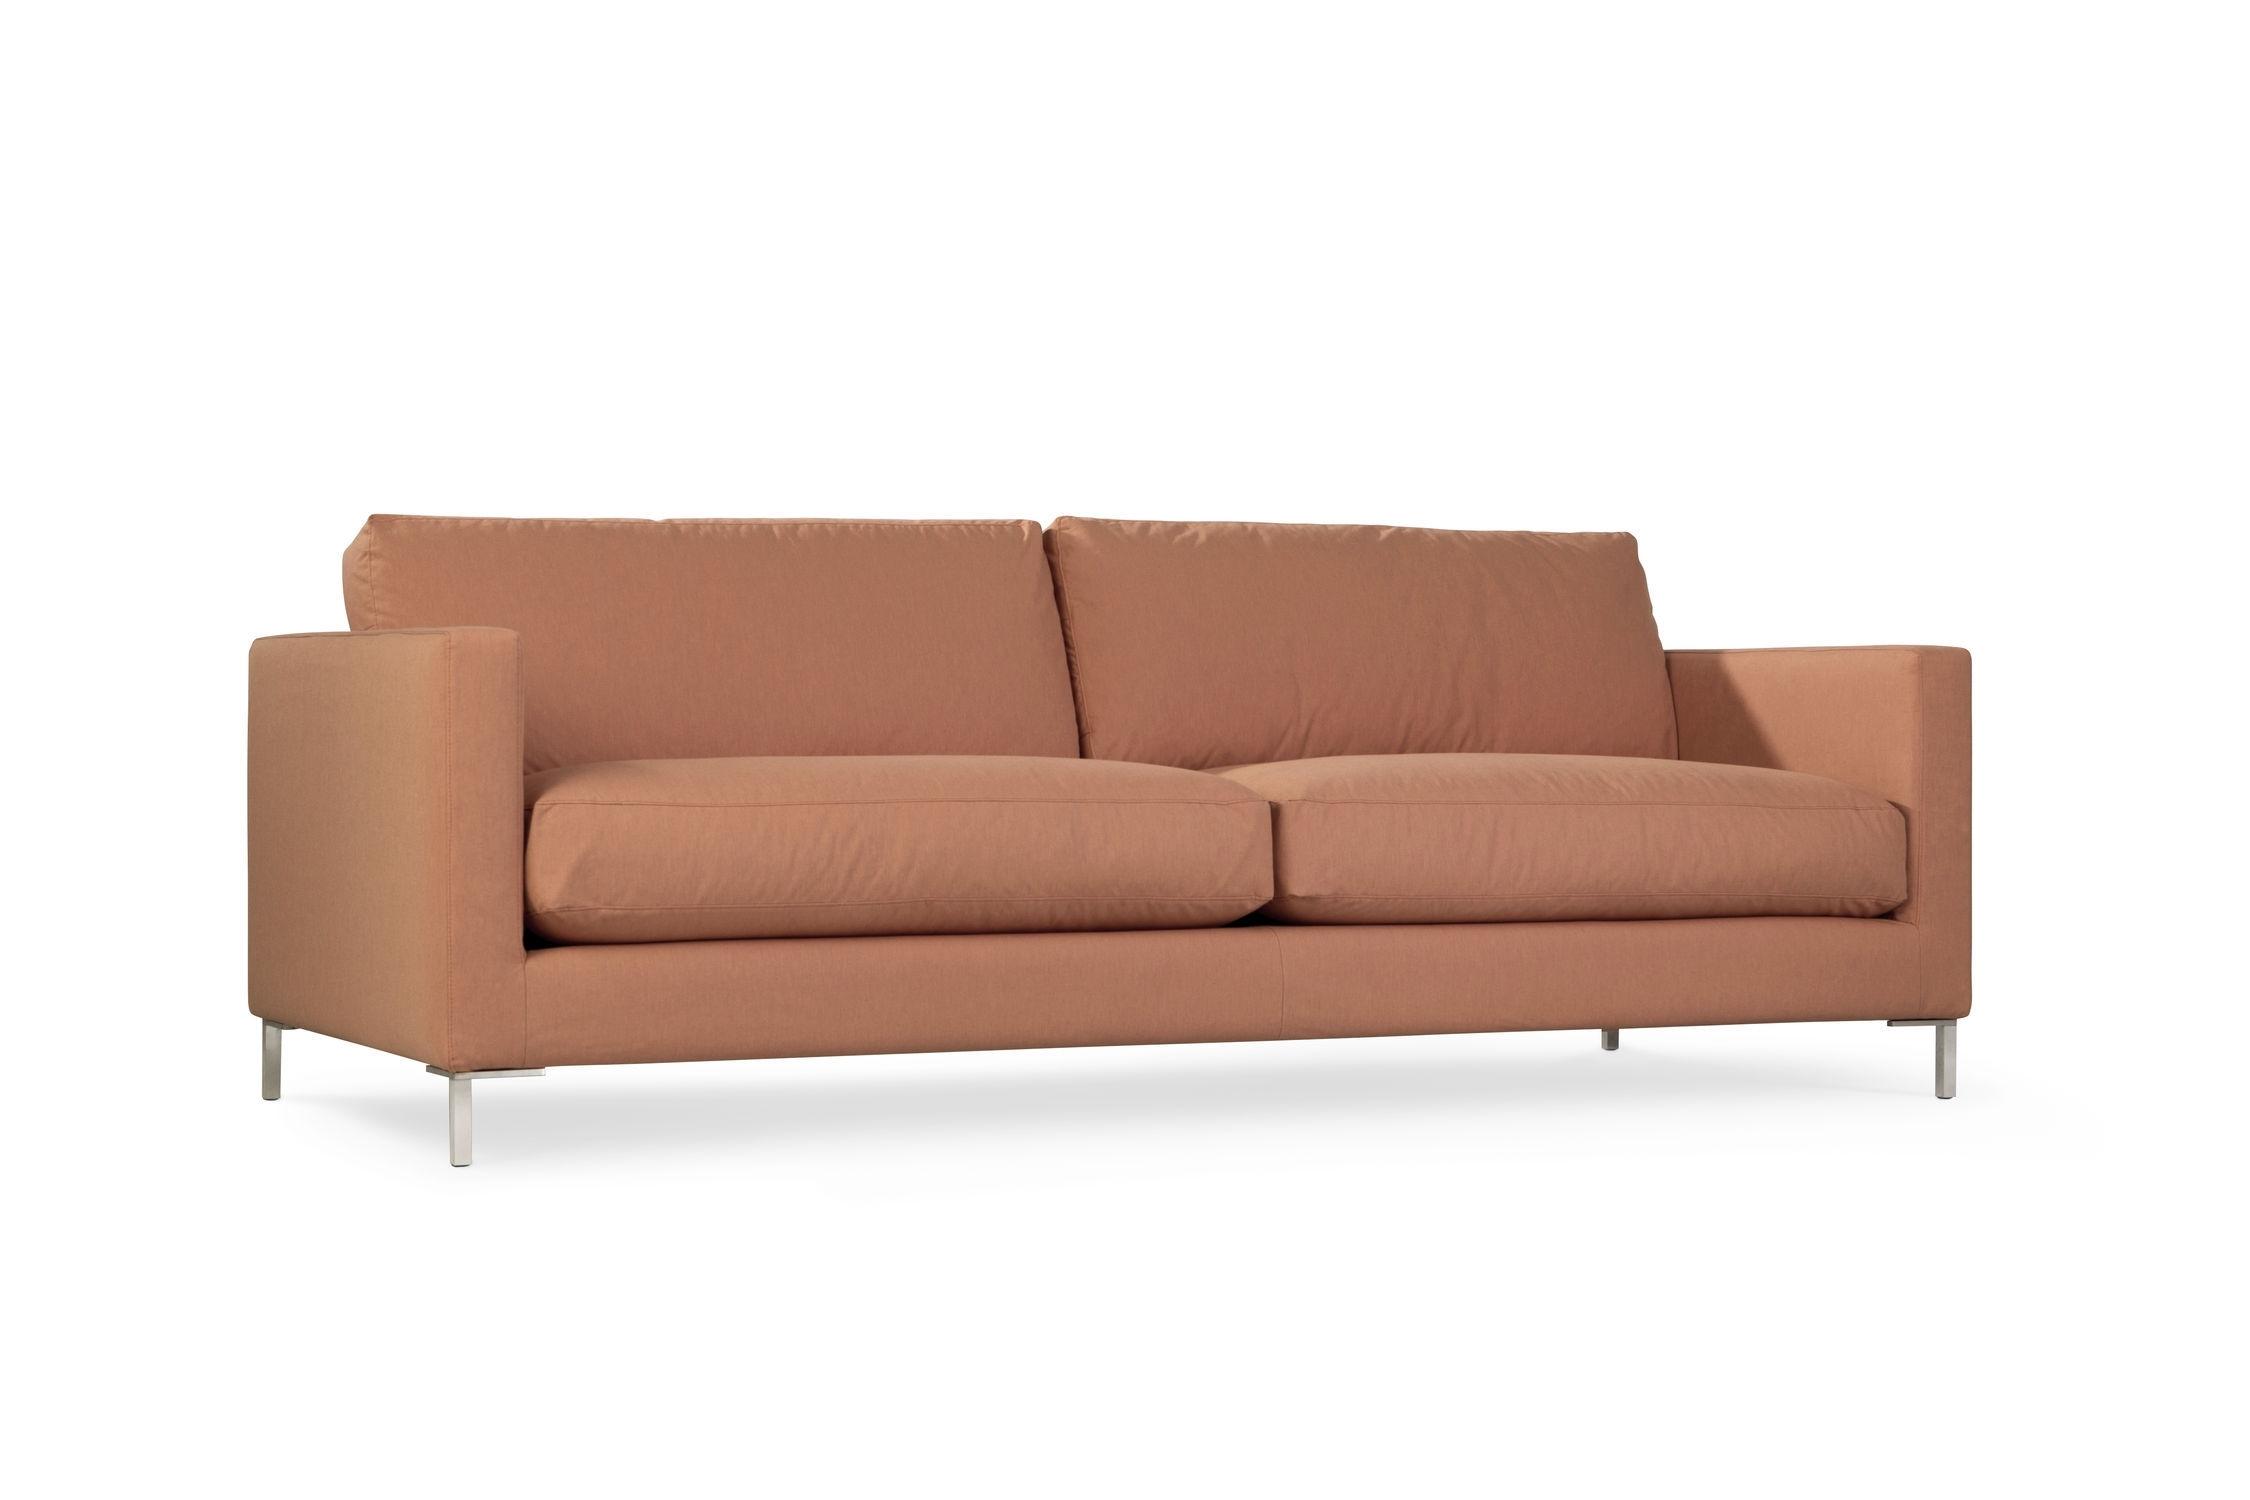 Furniture : Sofa Kijiji Oshawa Reclining Sofa Australia Klaussner Intended For Oshawa Sectional Sofas (View 9 of 10)